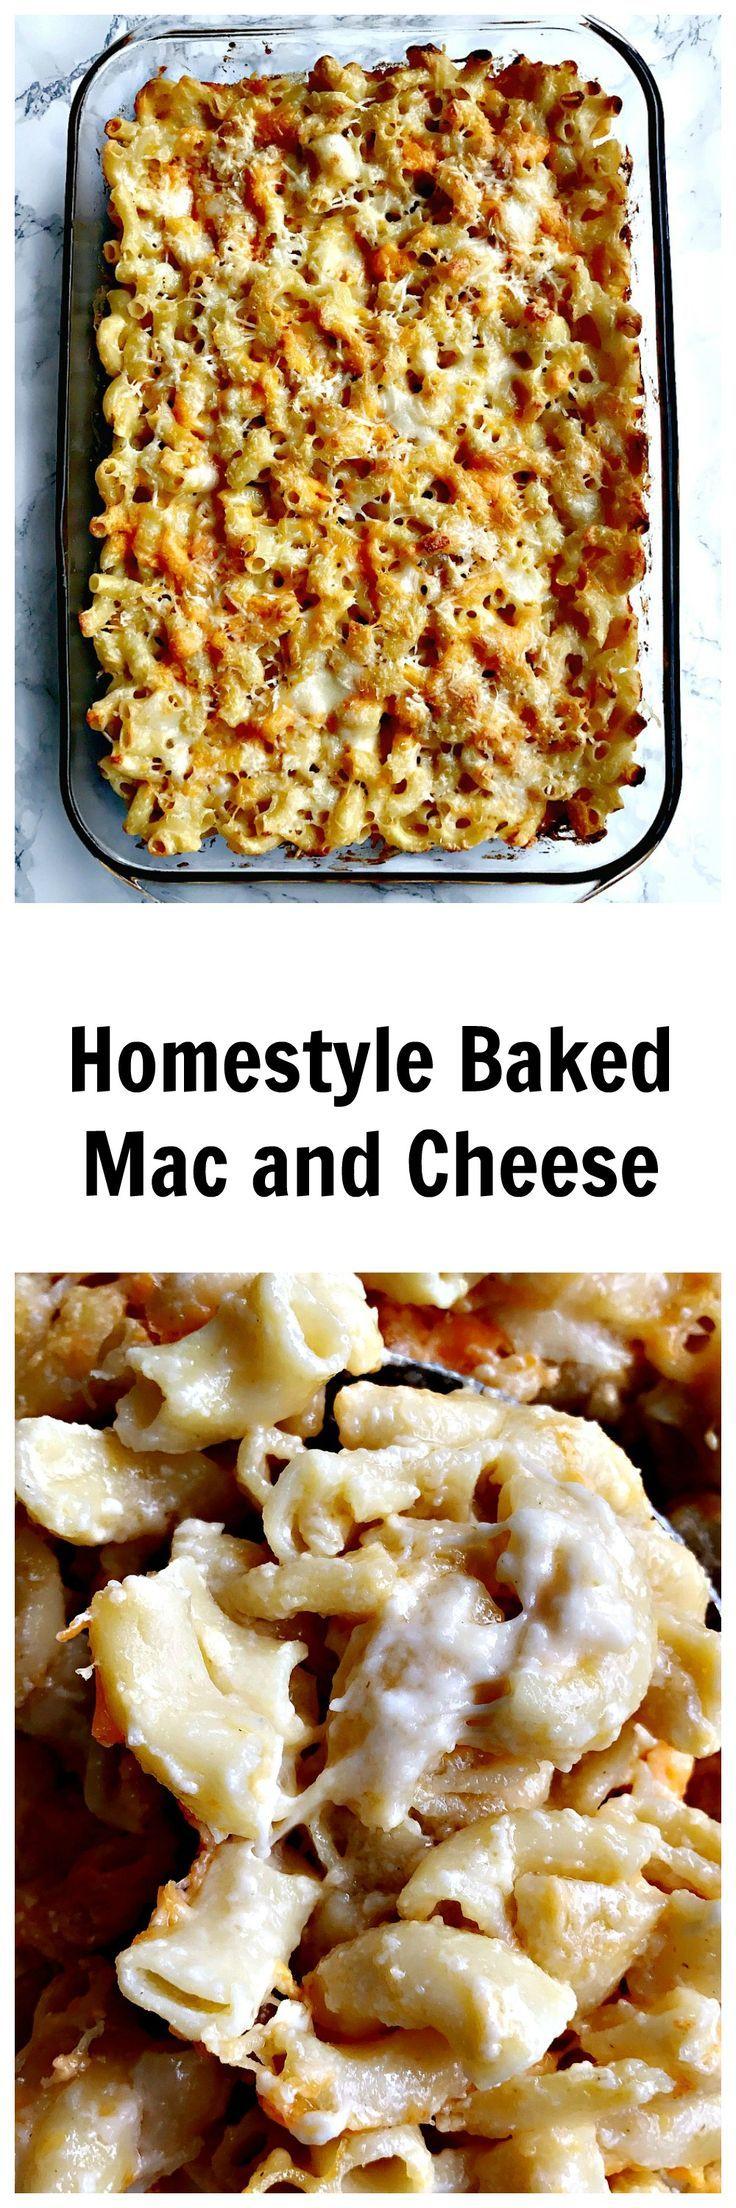 ... Baked Macaroni on Pinterest | Macaroni and cheese, Macaroni and Cheese